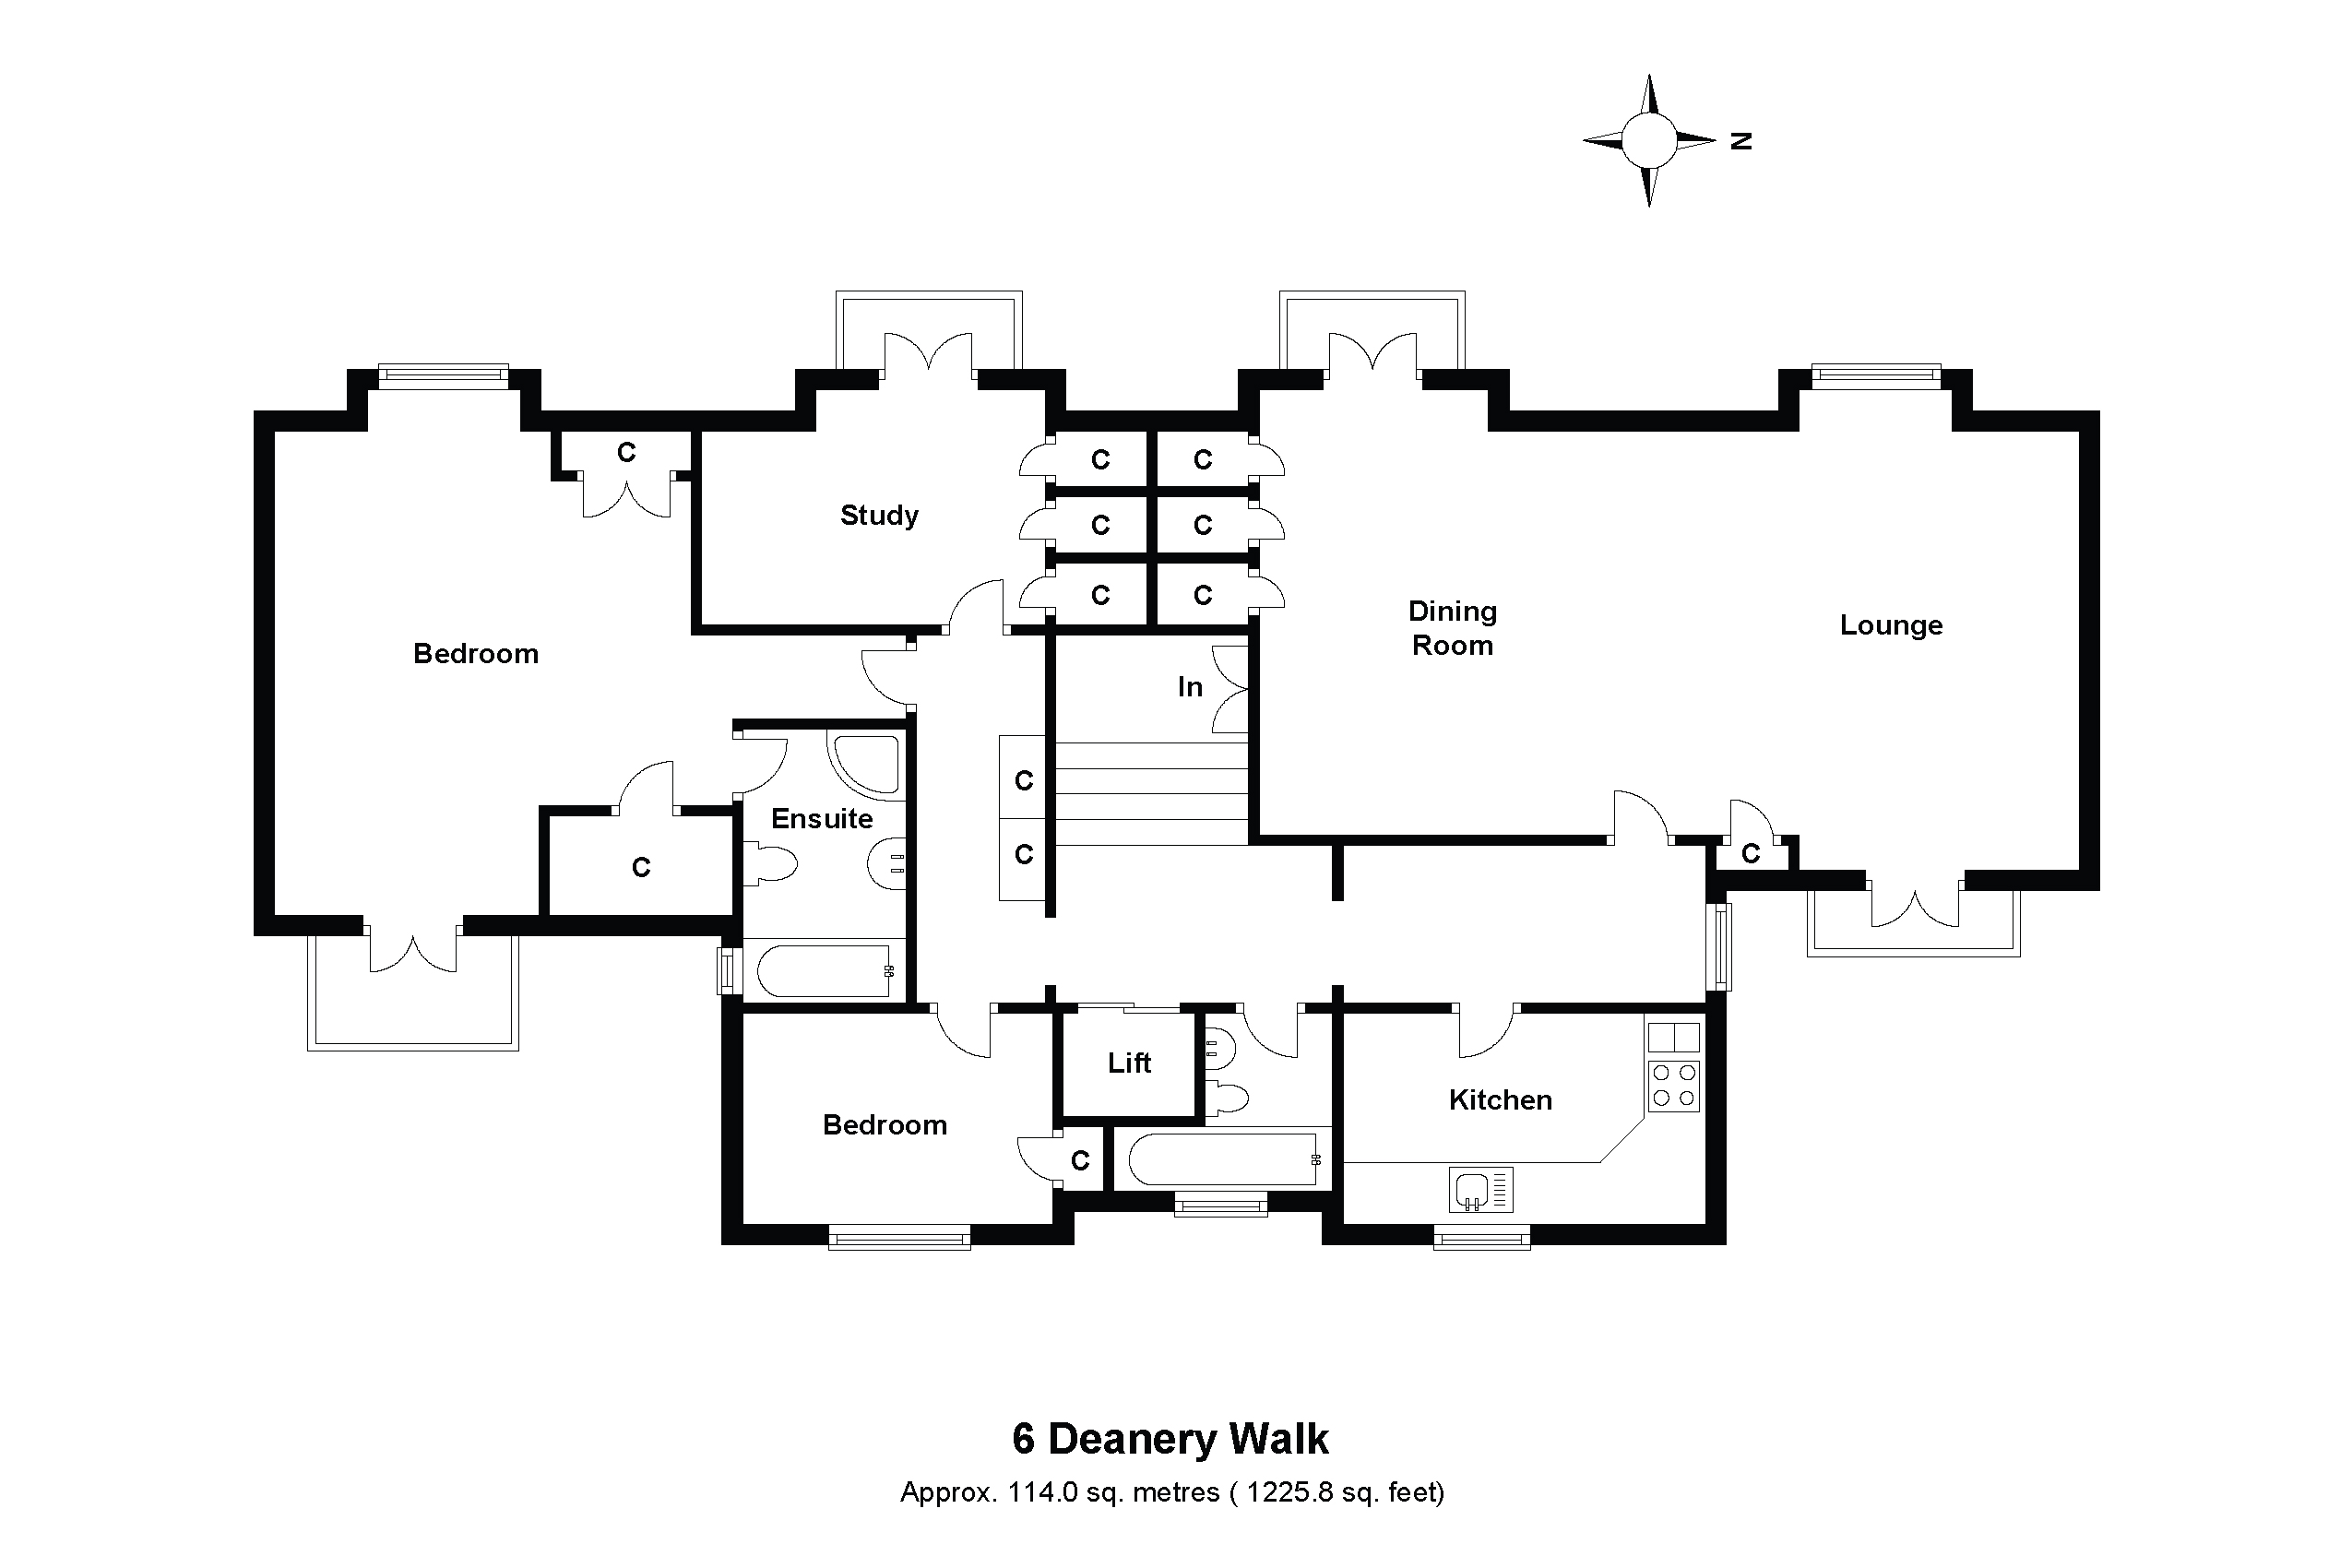 The Penthouse, 5 & 6 Deanery Walk Floorplan